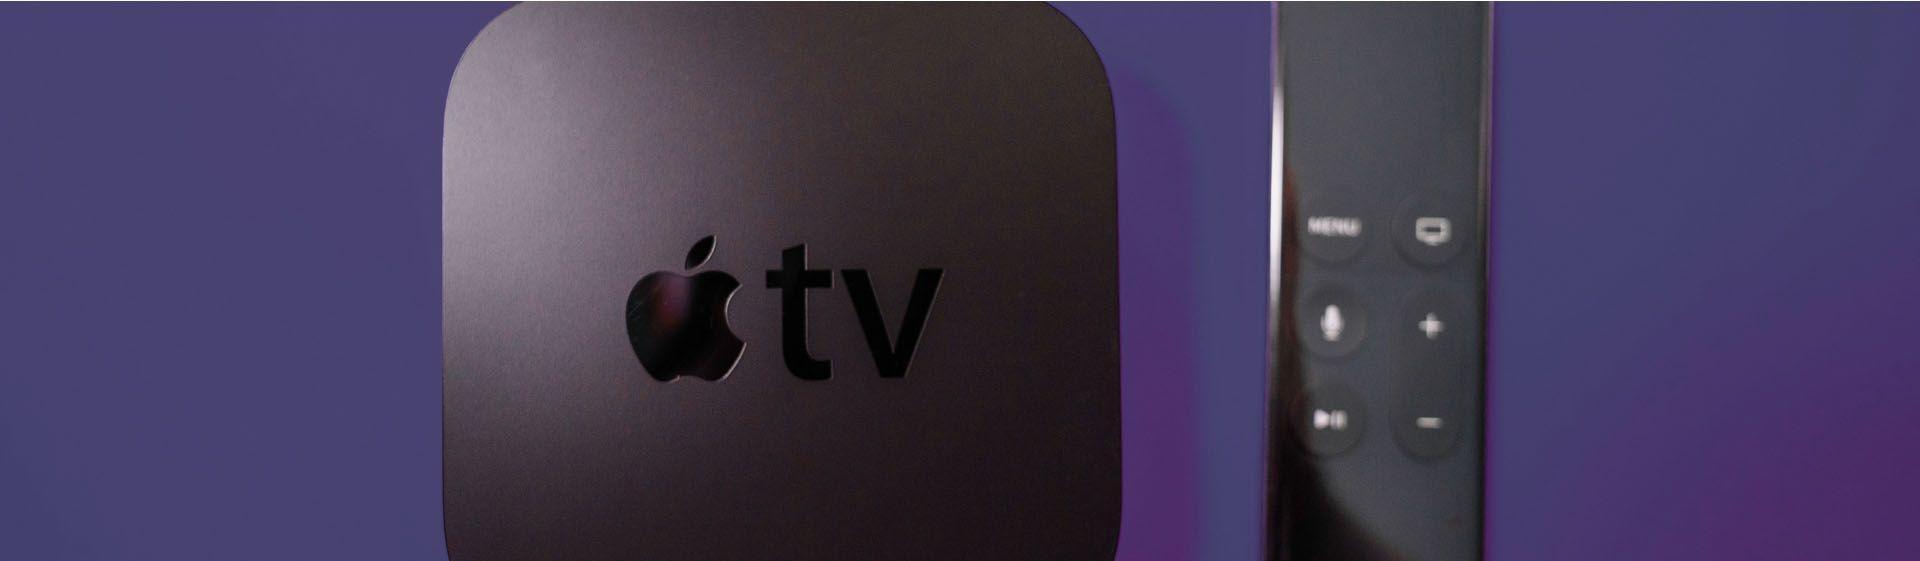 Apple TV 4K vale a pena? Confira análise dessa smart TV Box